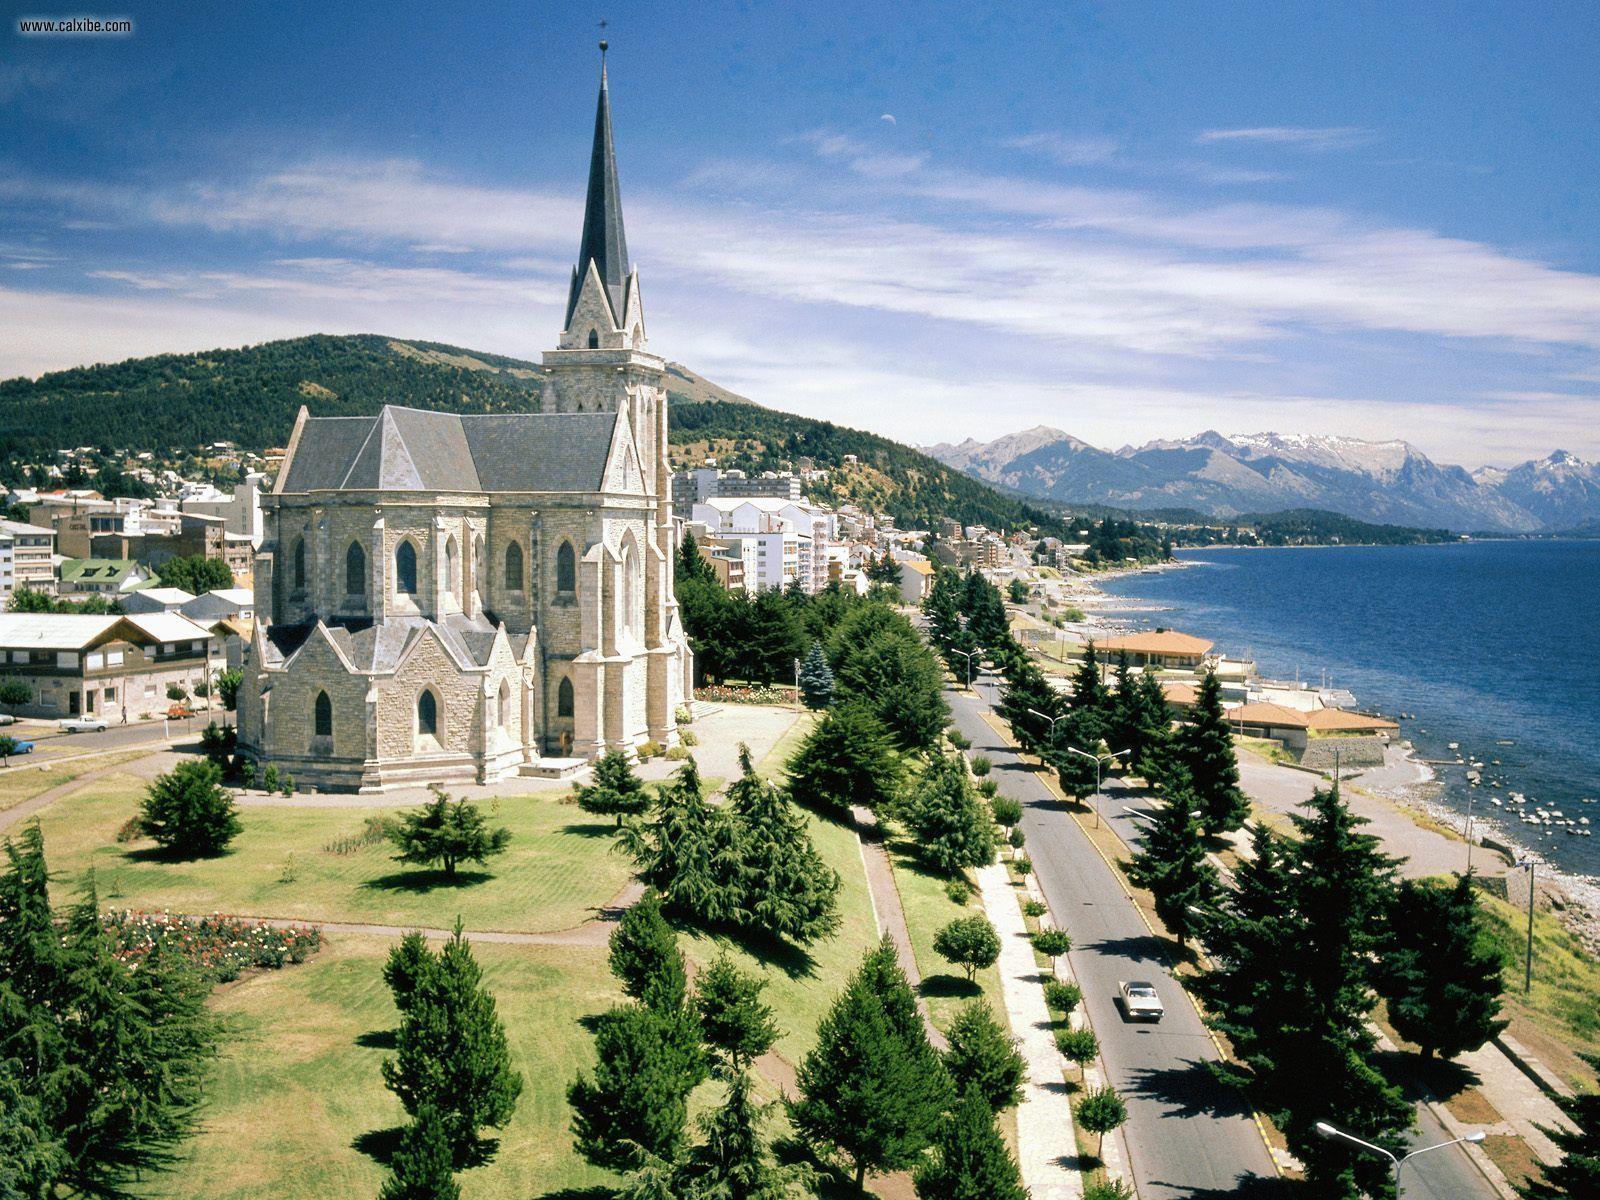 Top World Travel Destinations Bariloche Argentina